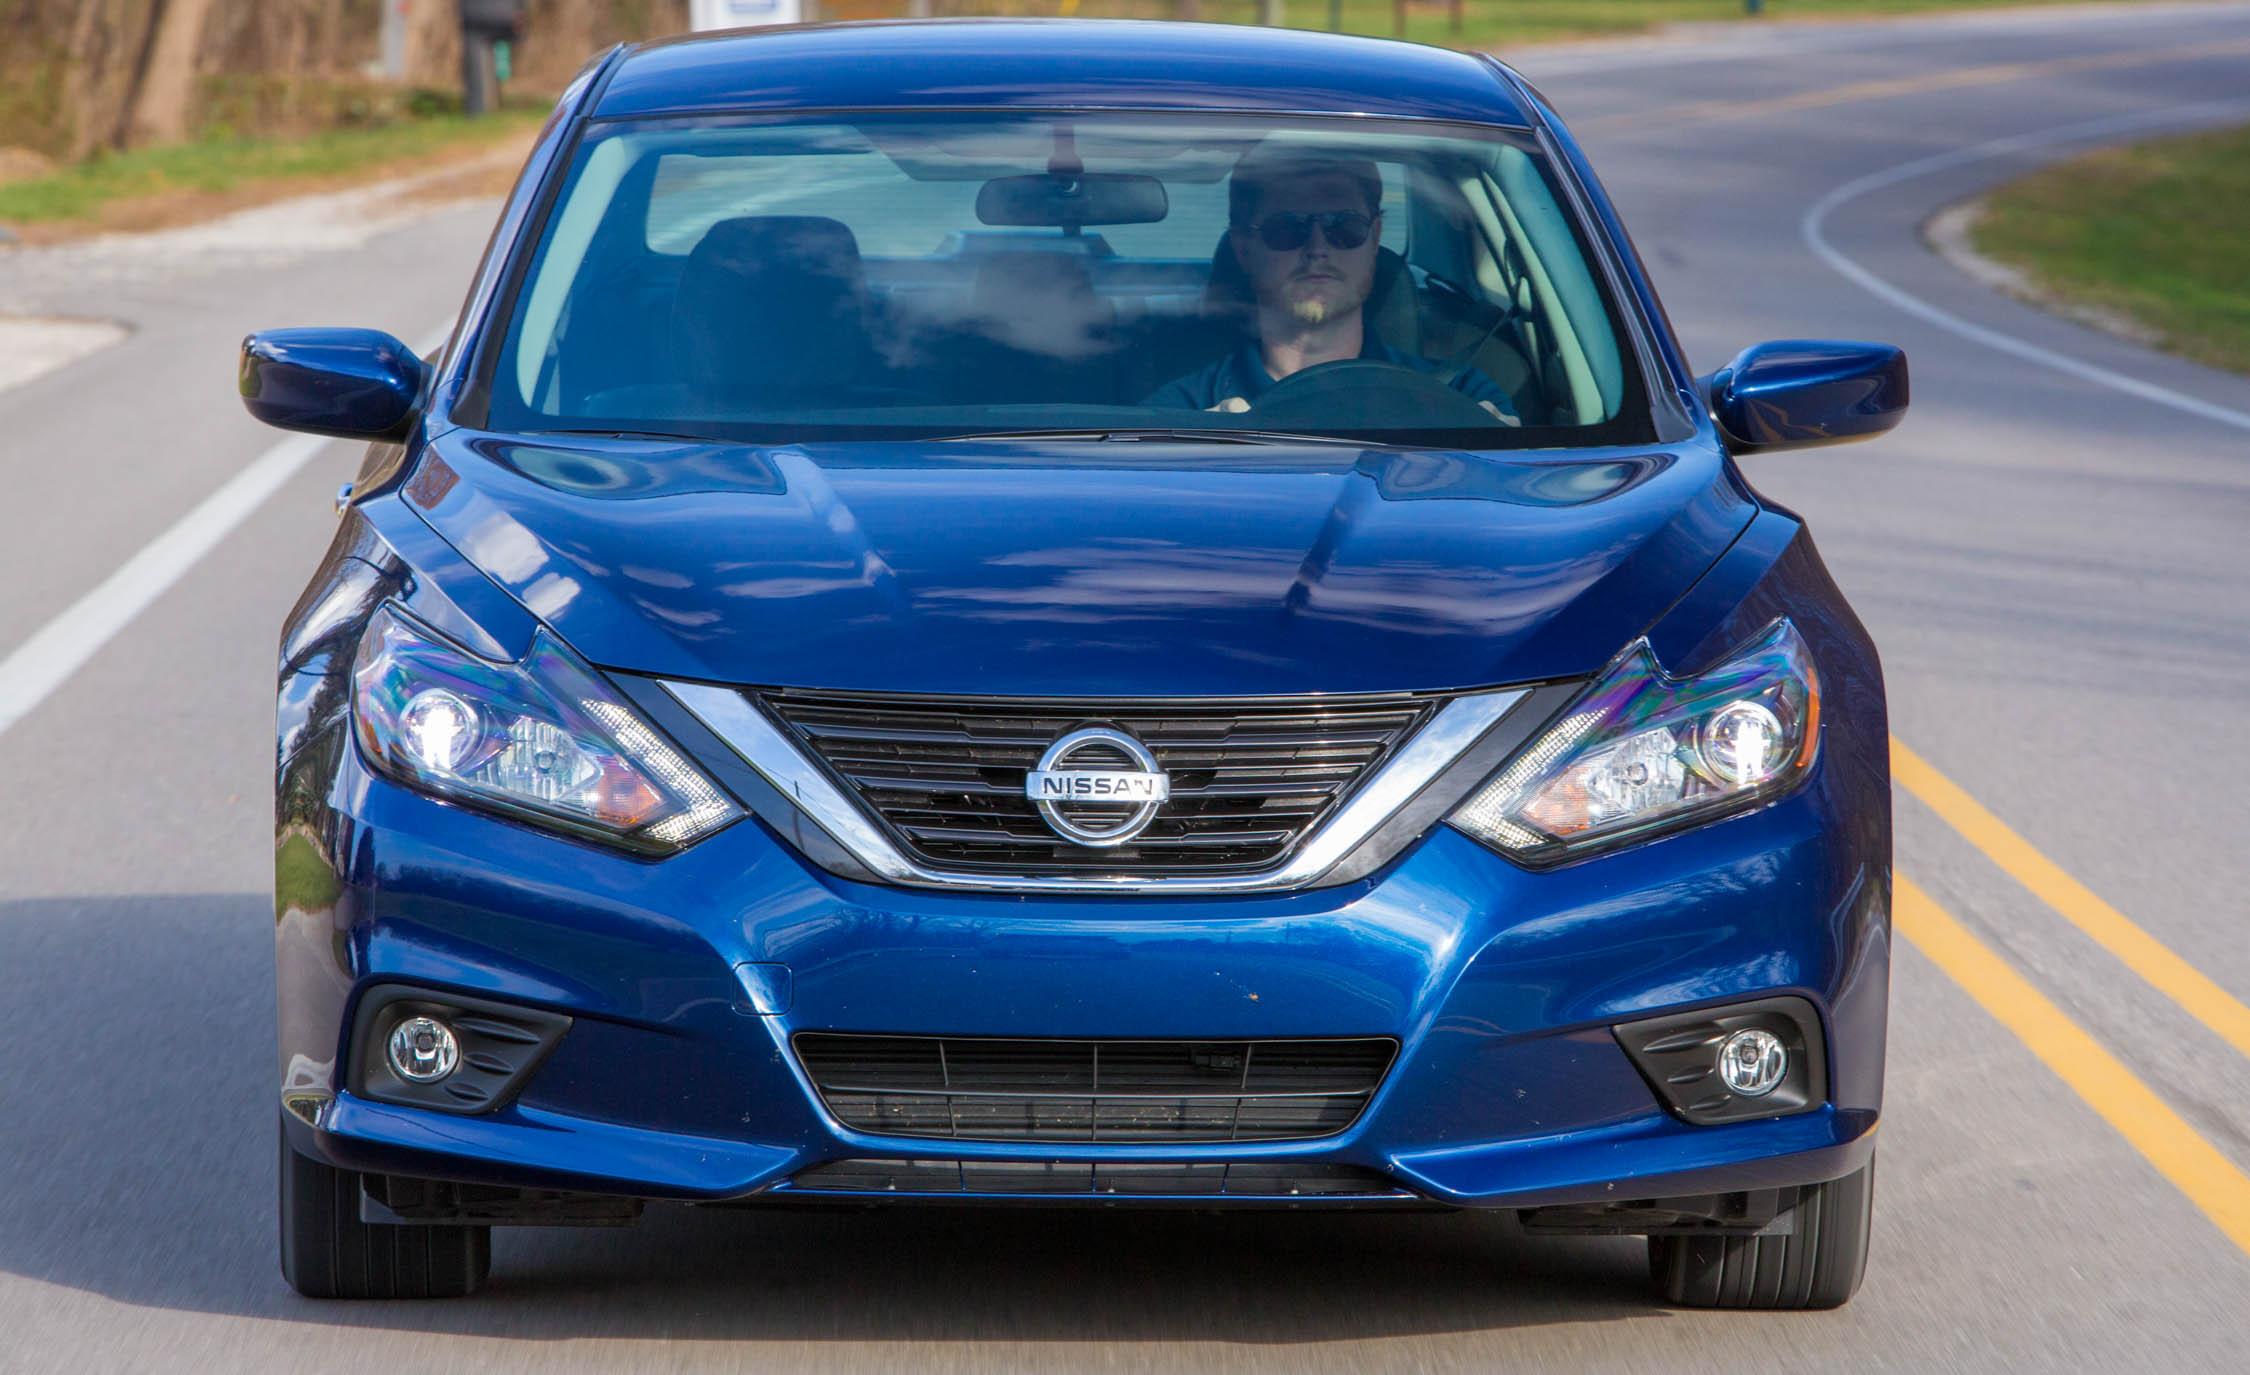 2016 Nissan Altima Exterior Front End